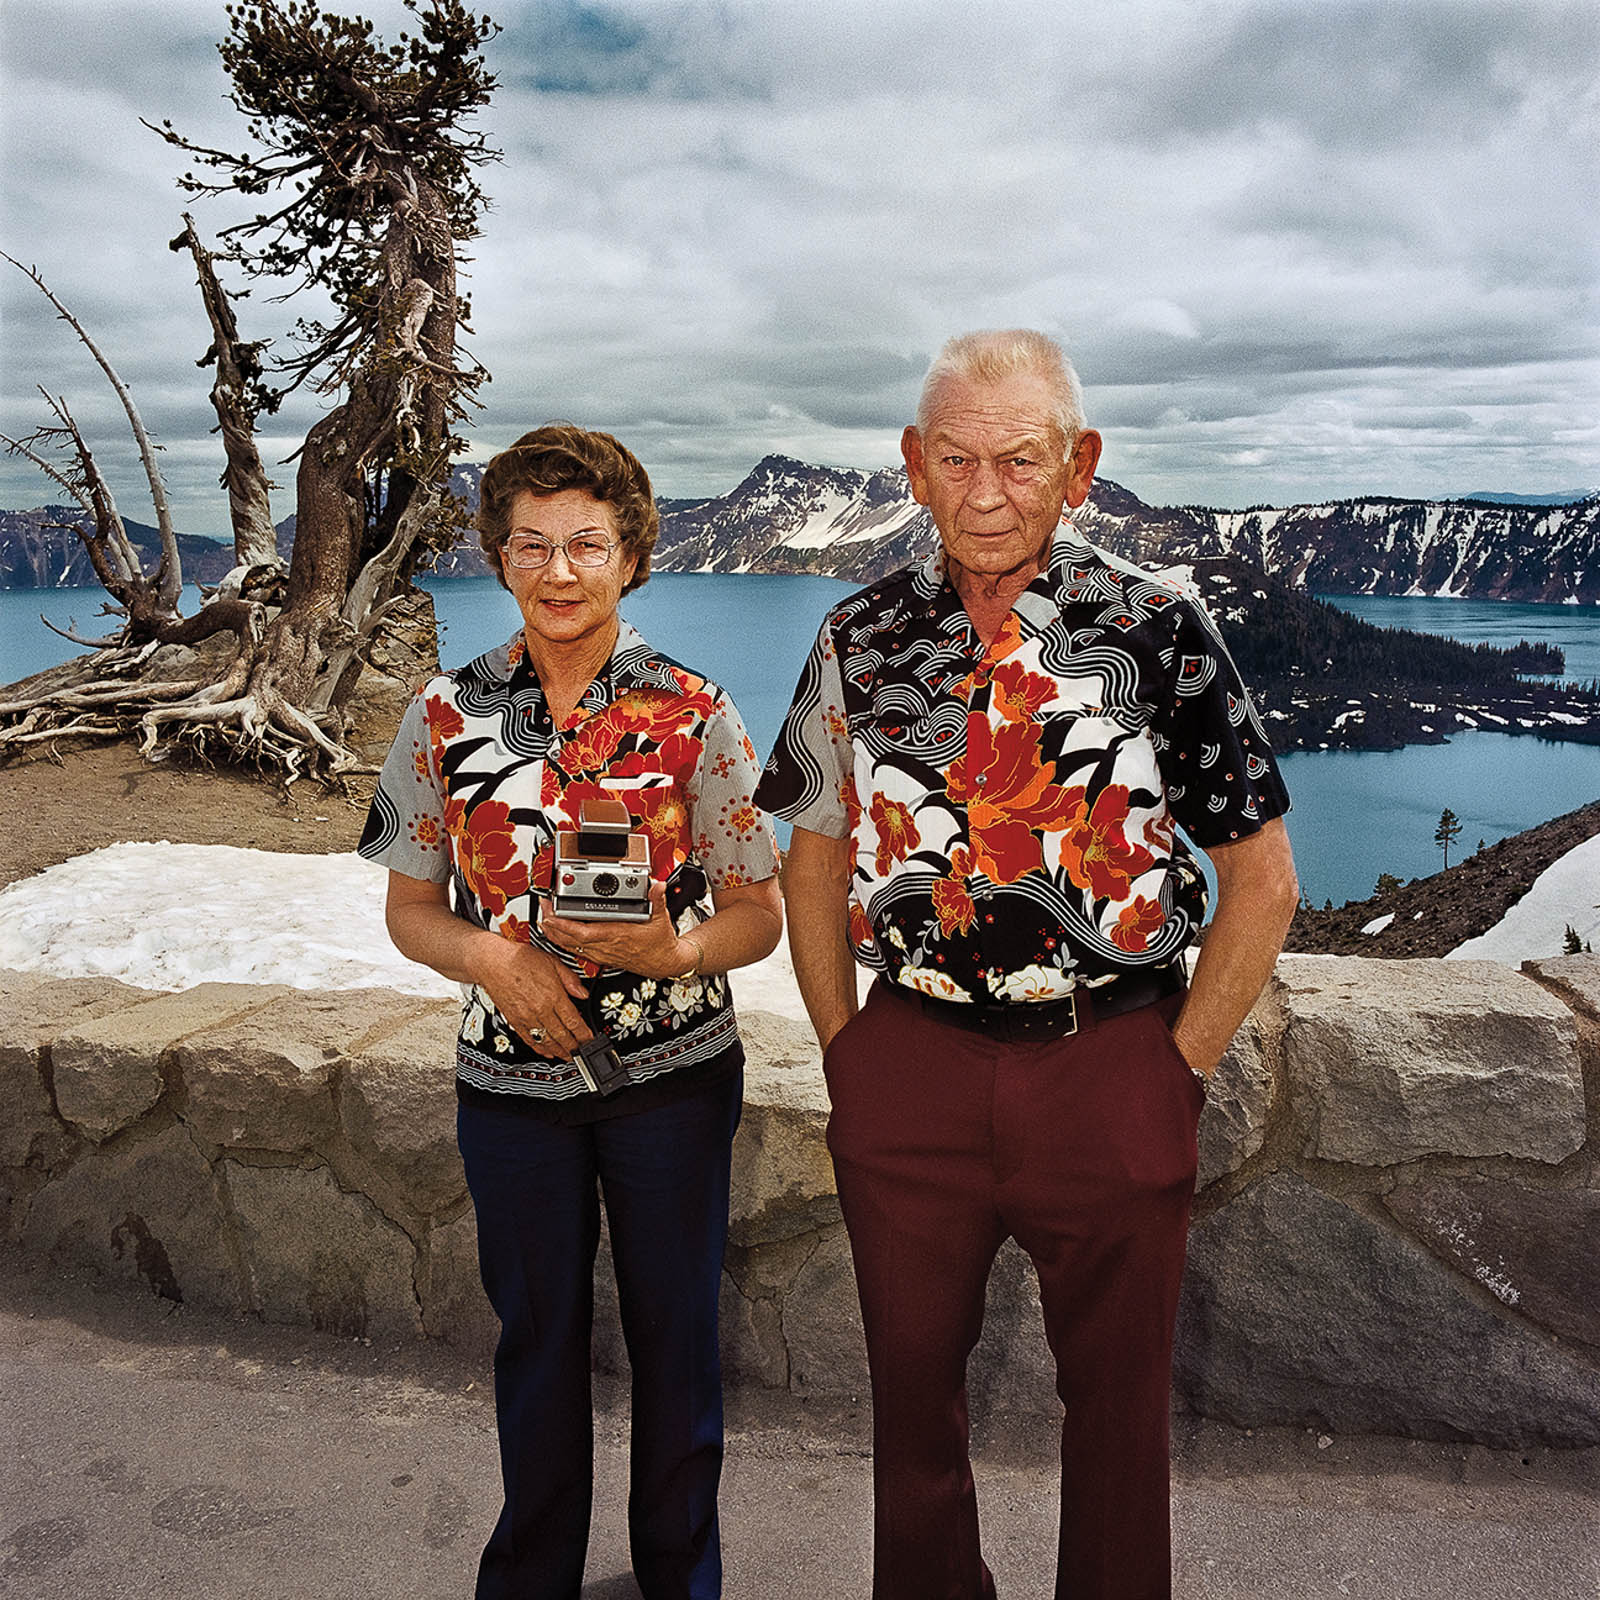 Couple at Crater Lake National Park, Oregon 1980